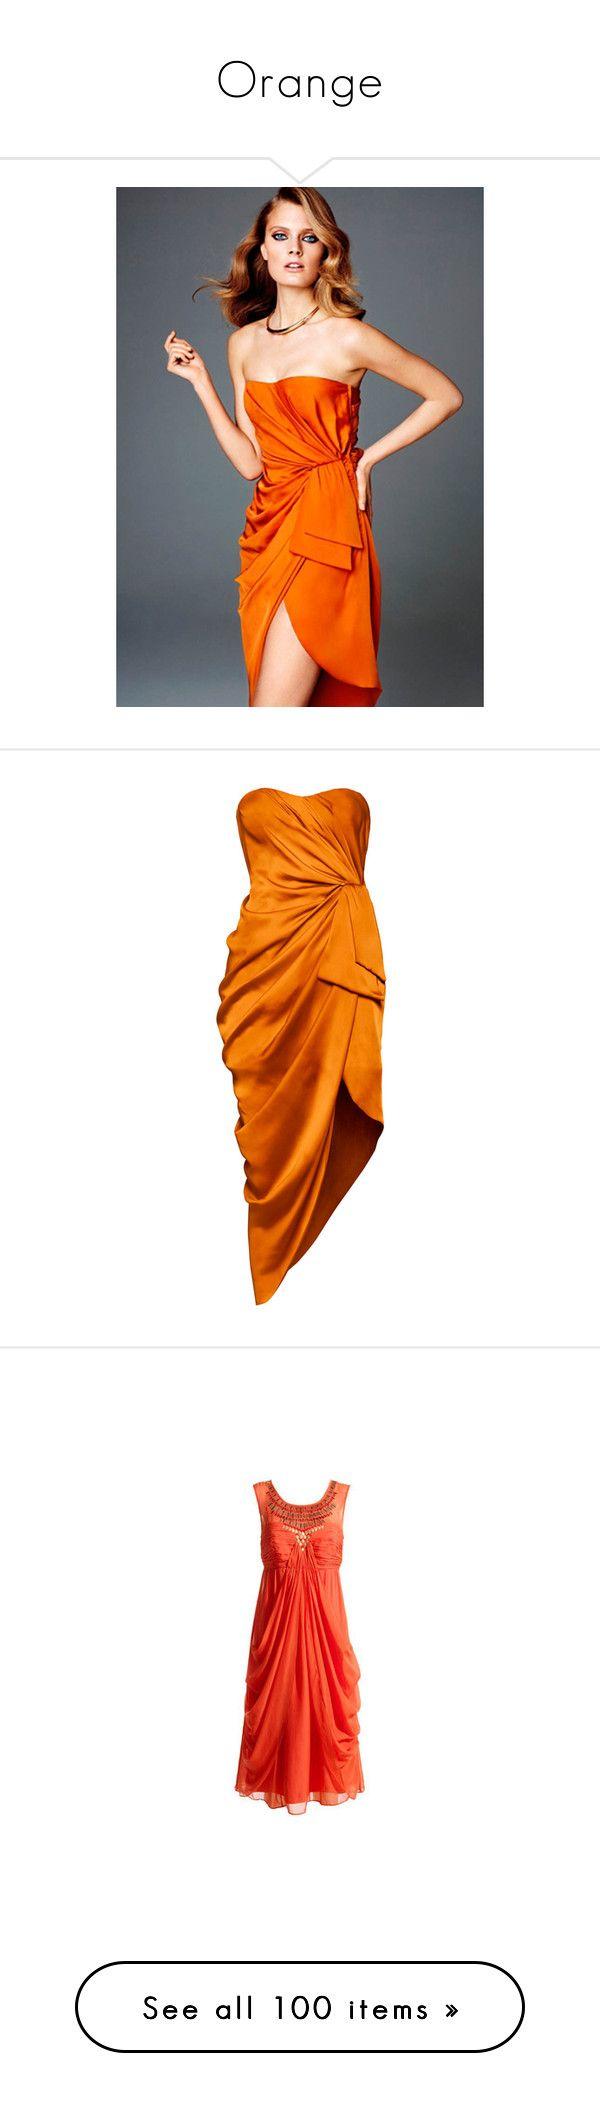 """Orange"" by sella103 ❤ liked on Polyvore featuring models, h&m, dresses, orange, vestidos, orange dress, lined dress, orange cocktail dress, drapey dress and satin dress"